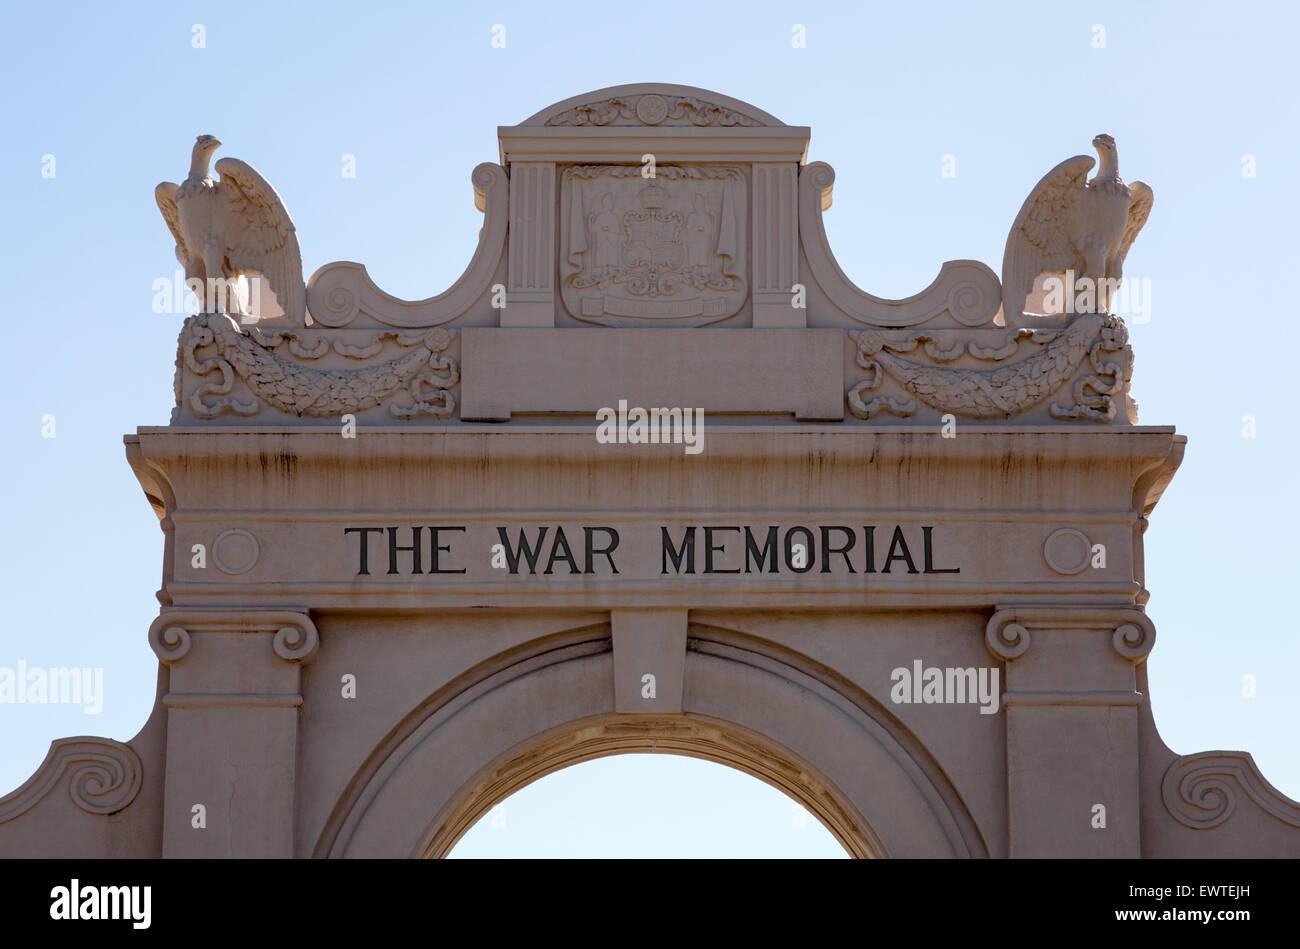 Honolulu, Hawaii. 26th Jun, 2015. The arch entrance to the Waikiki Natatorium War Memorial in Waikiki, Honolulu, - Stock Image